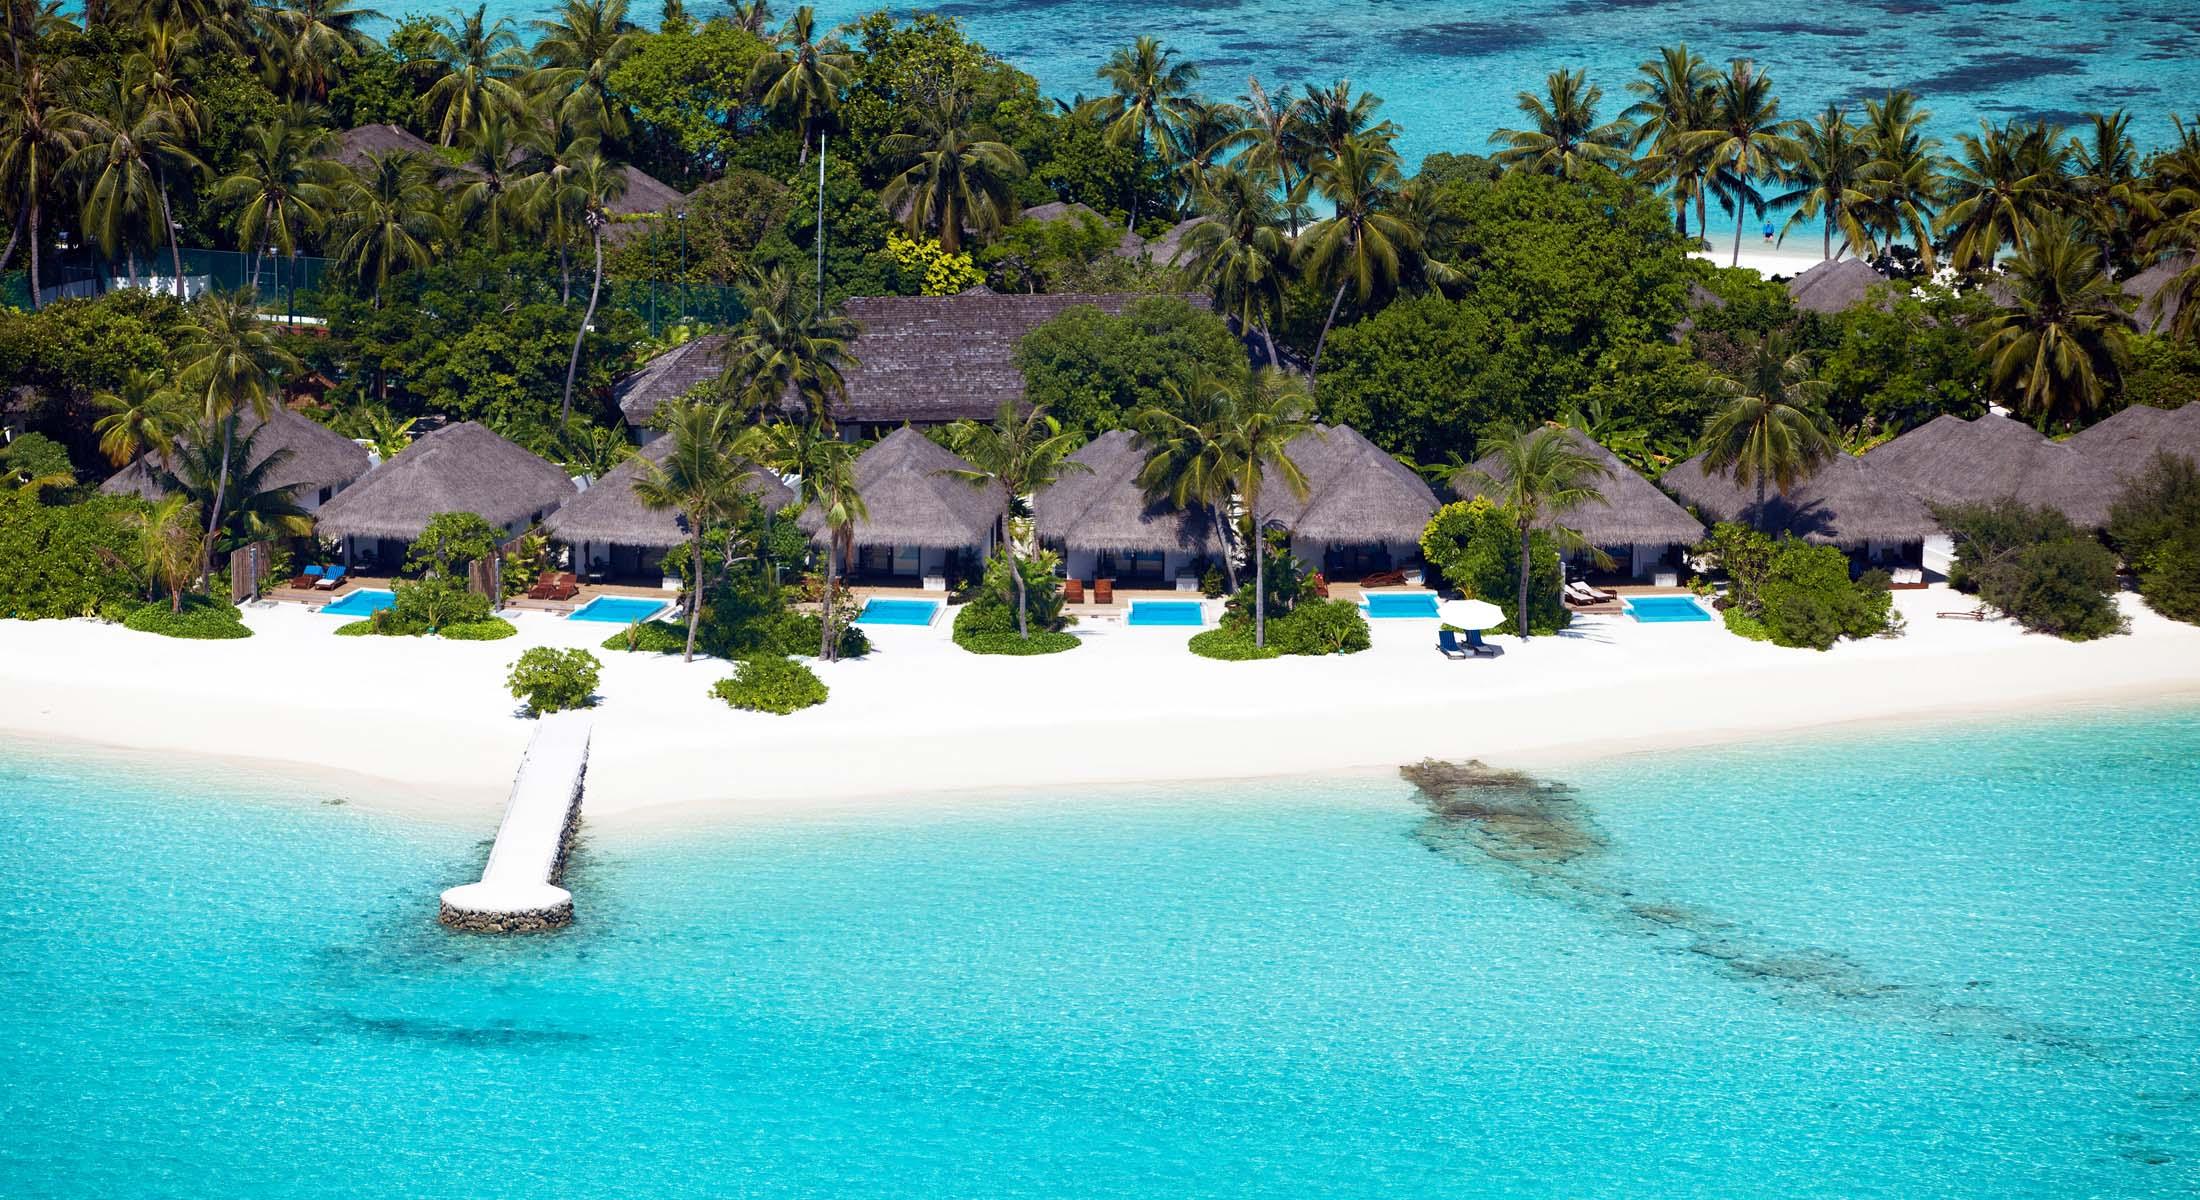 Deluxe Villa Packages at Velassaru Maldives